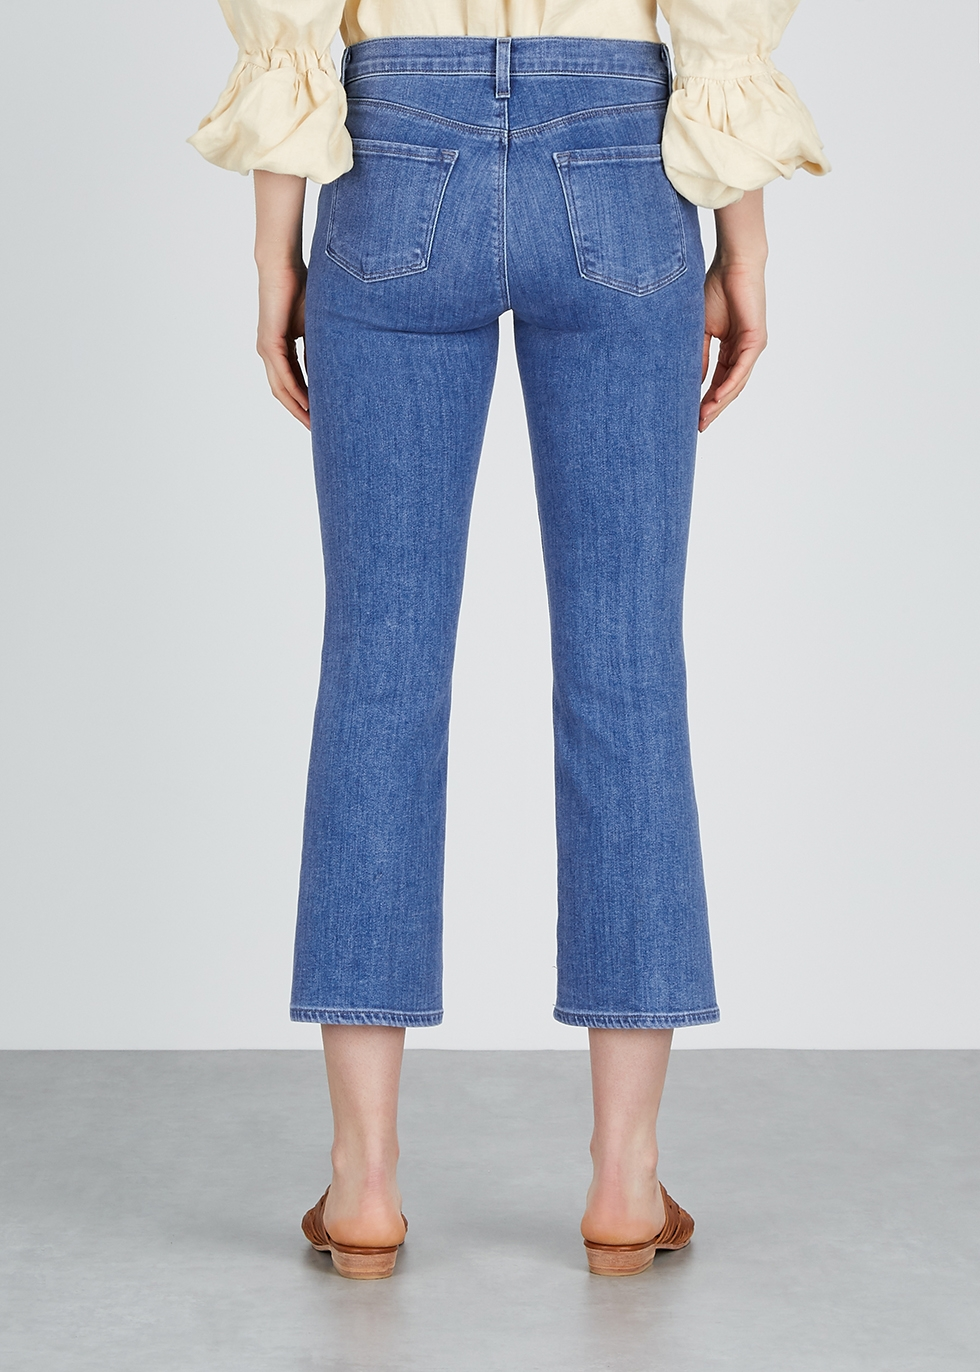 Selena blue bootcut jeans - J Brand